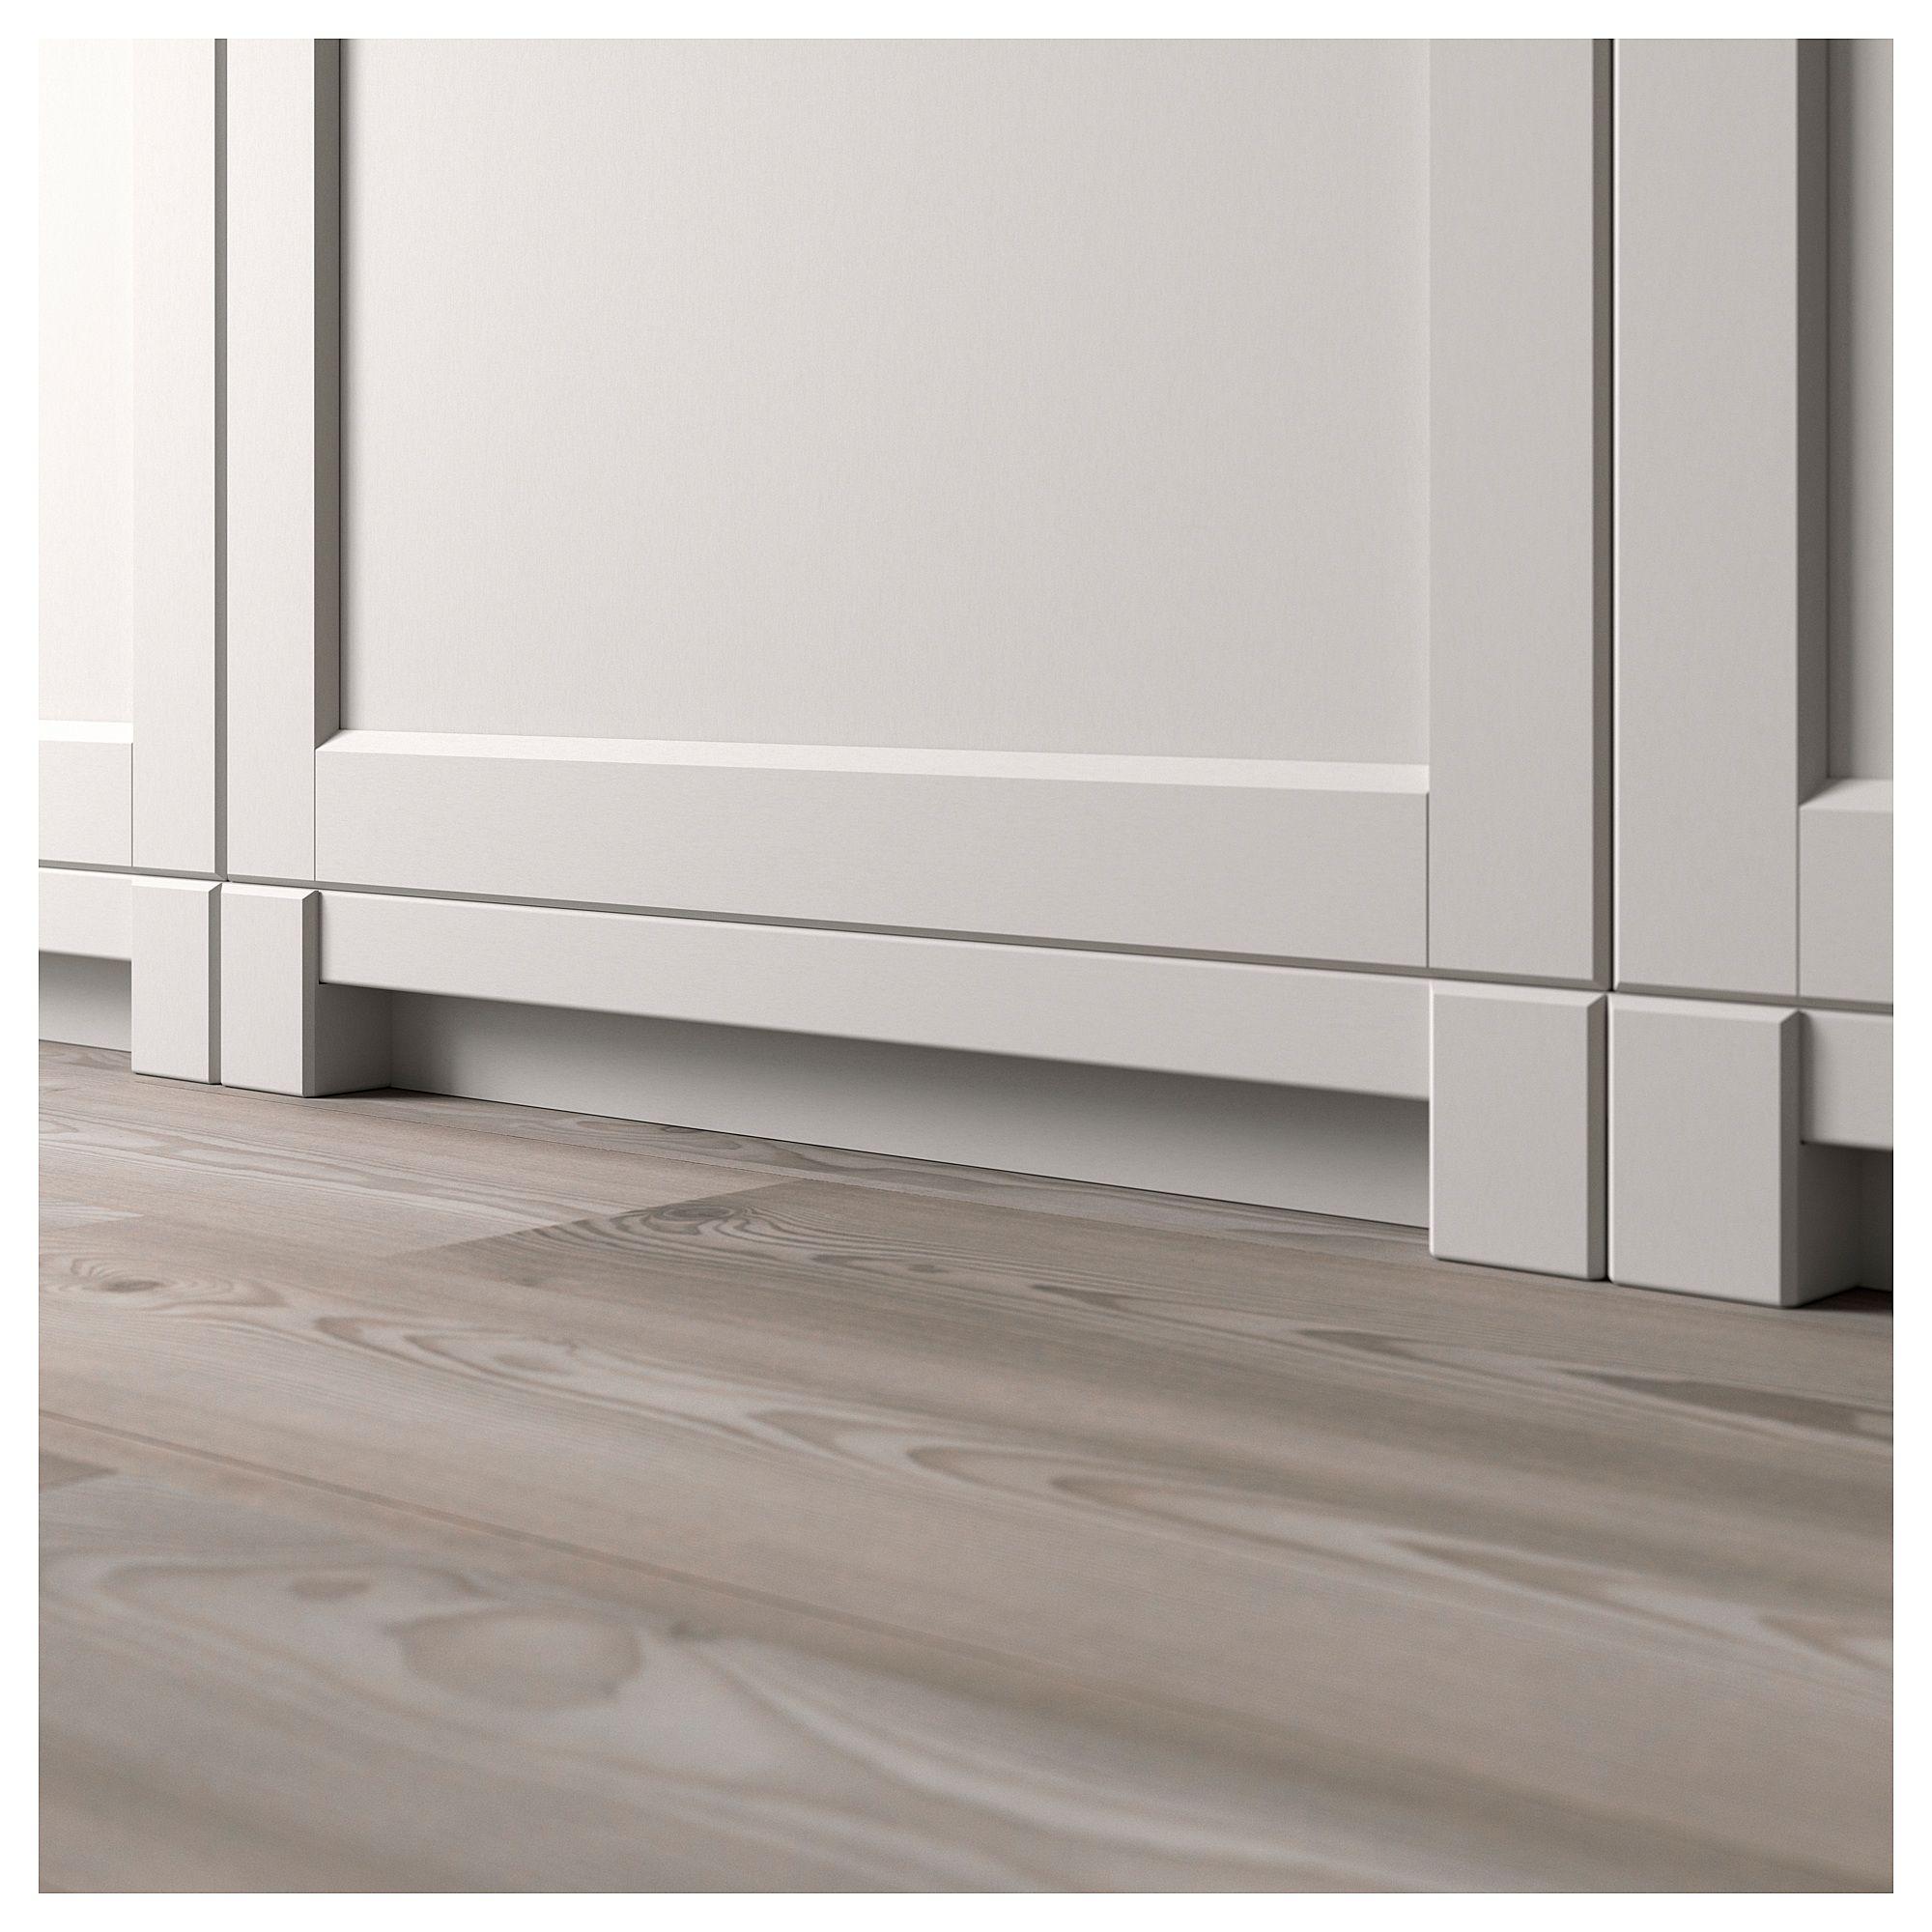 Best Lerhyttan Leg For Decorative Plinth Light Grey 8 Cm 640 x 480